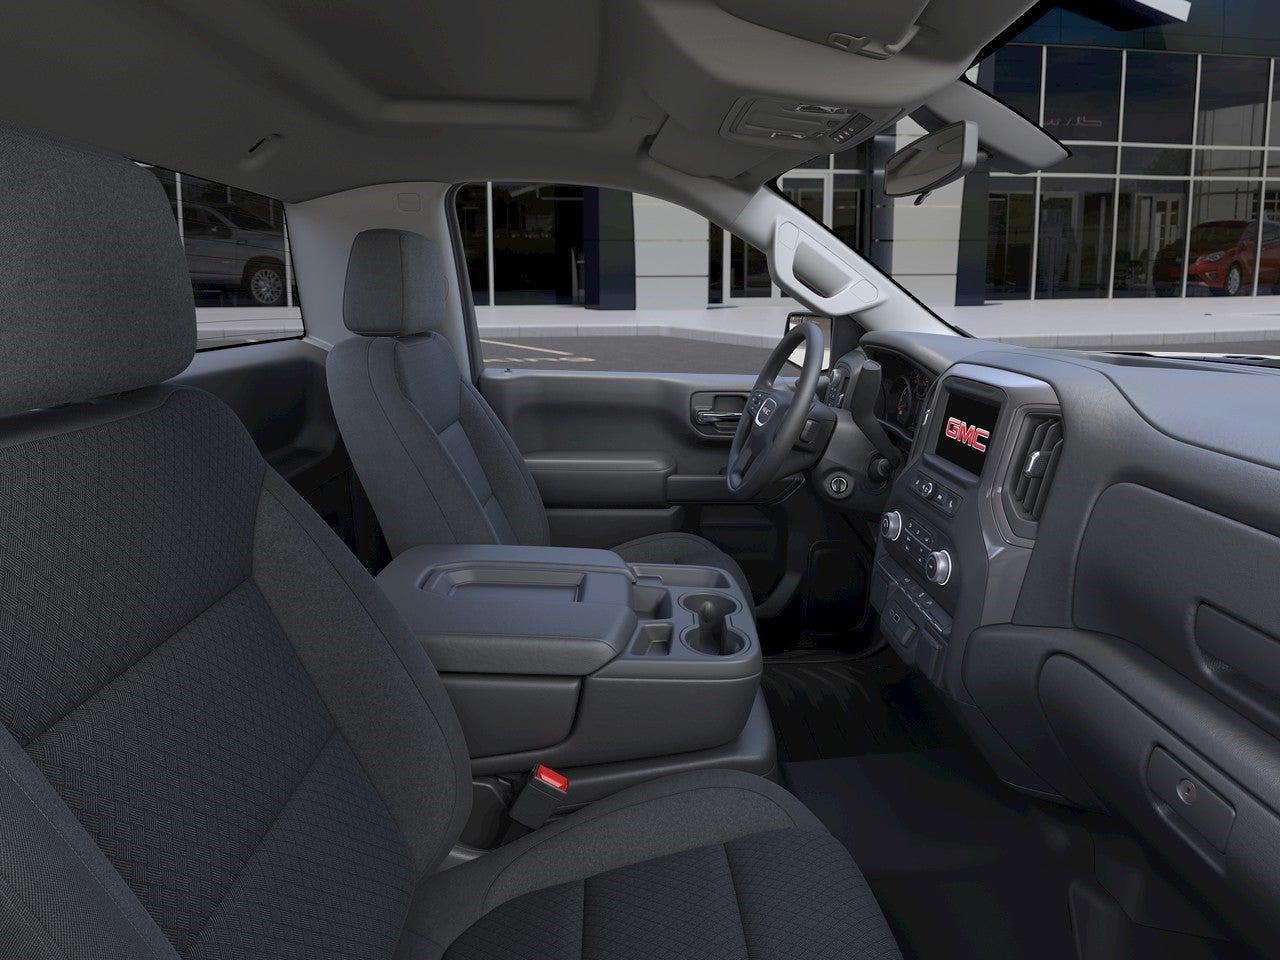 2021 GMC Sierra 1500 Regular Cab 4x4, Pickup #V21180 - photo 34